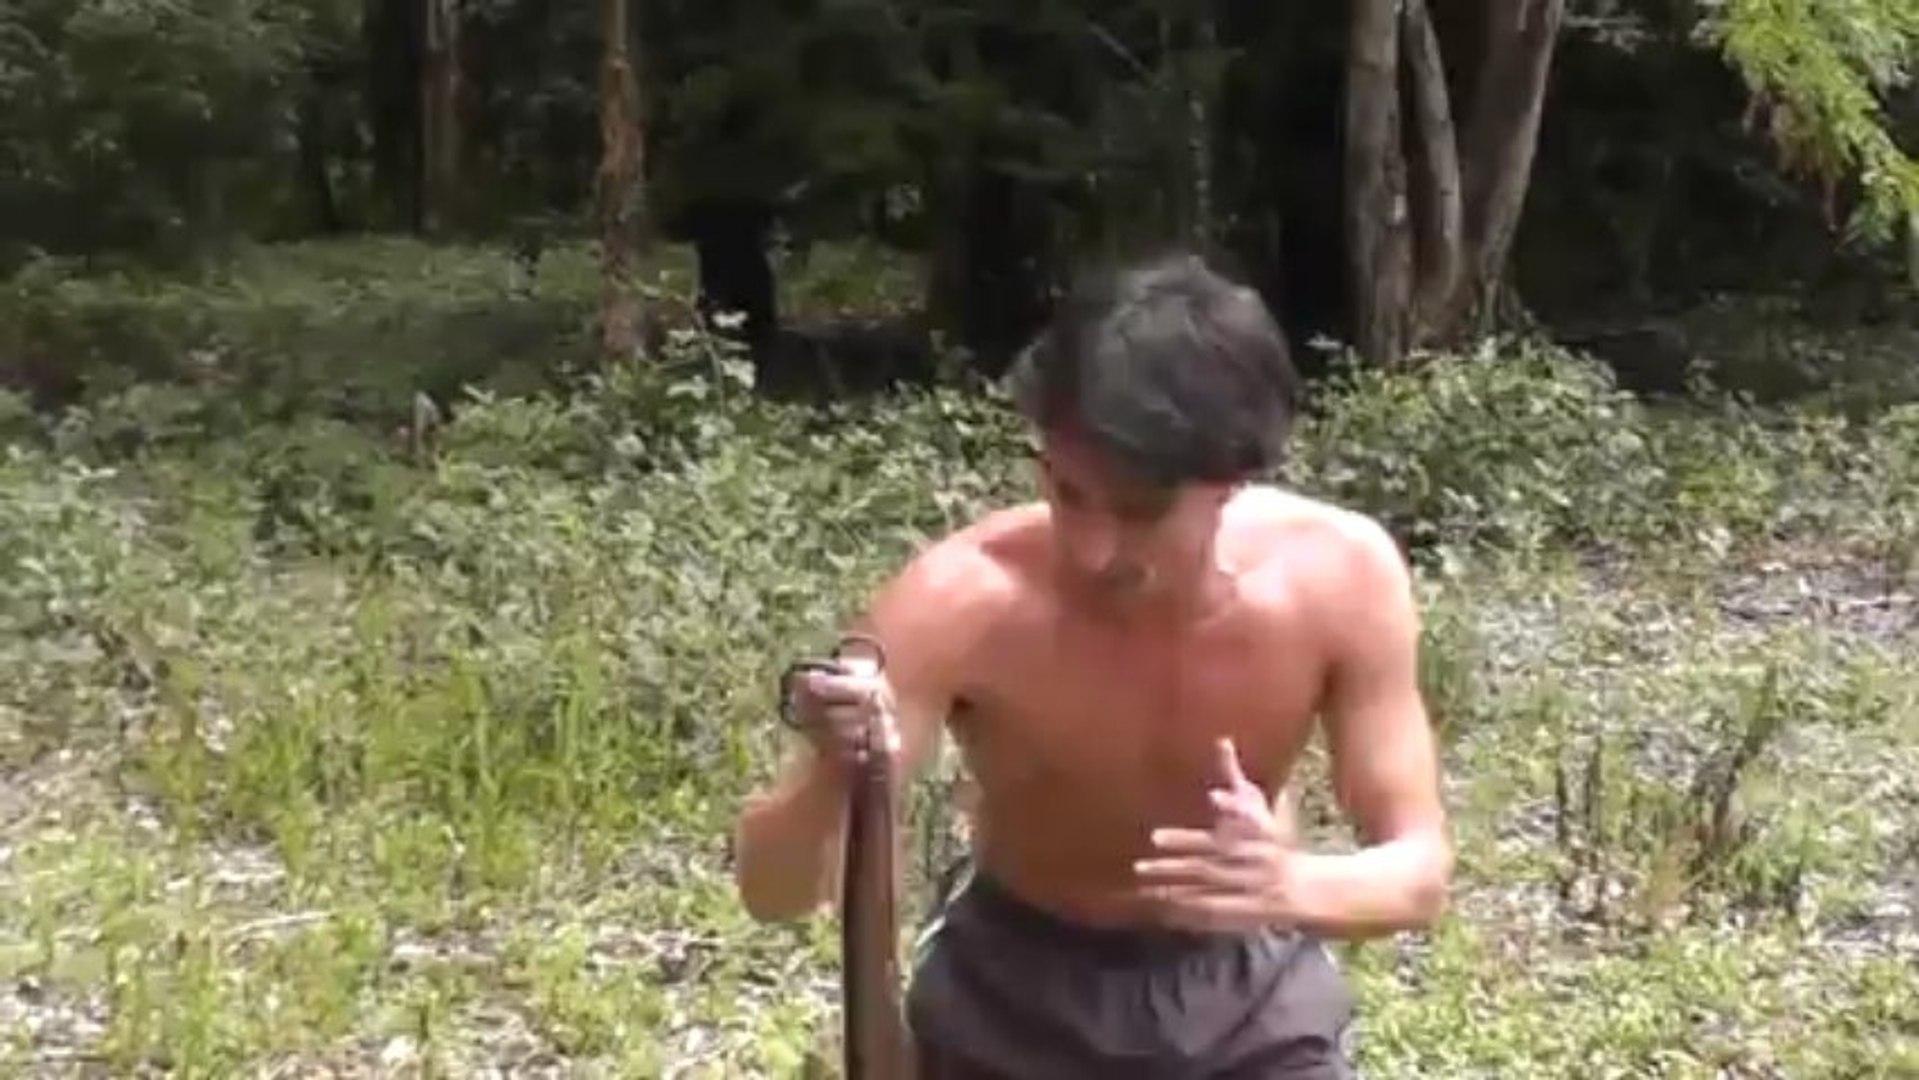 Catching Wild Rabbits using Snakes BAREHANDED Rabbit hunting